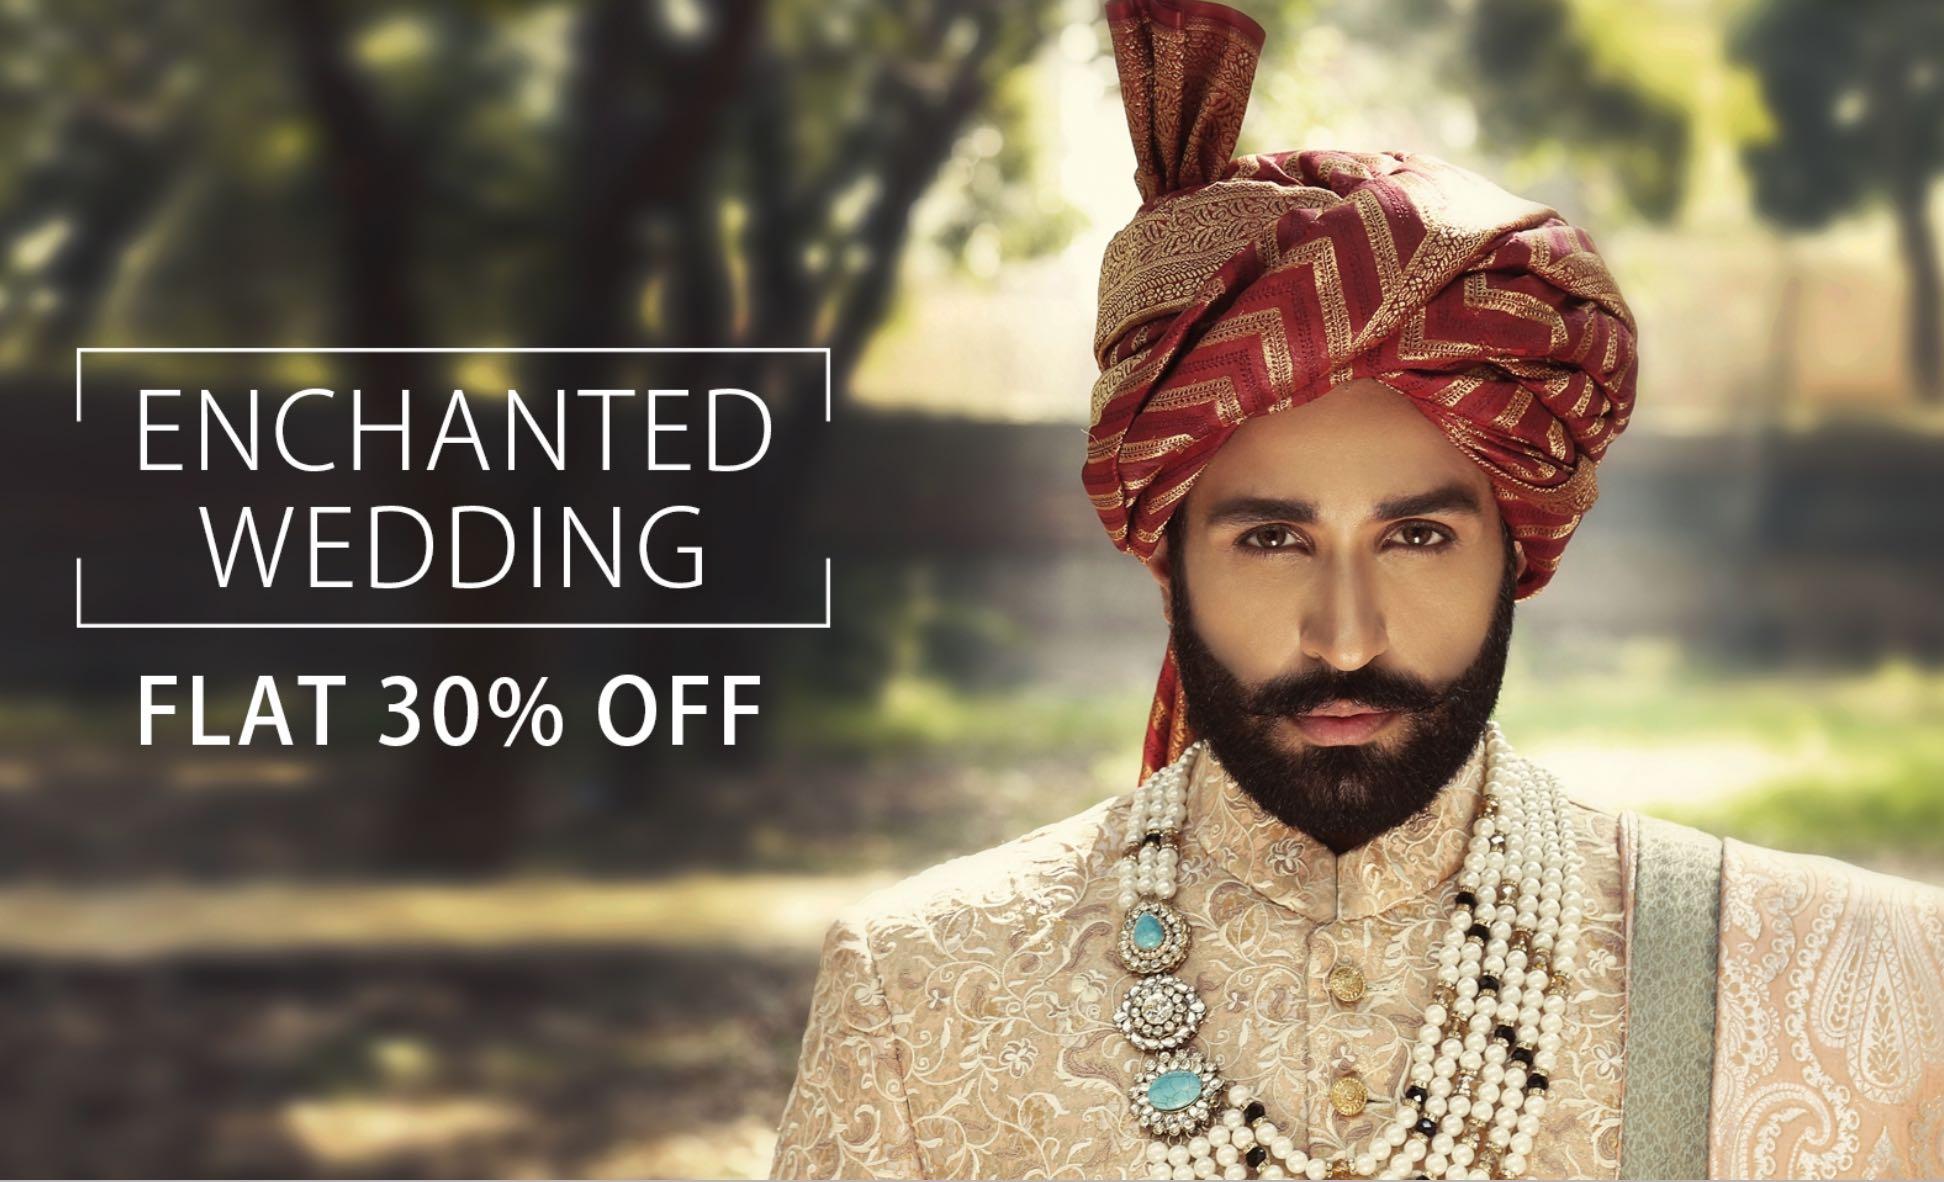 Amir Adnan - Enchanted Wedding